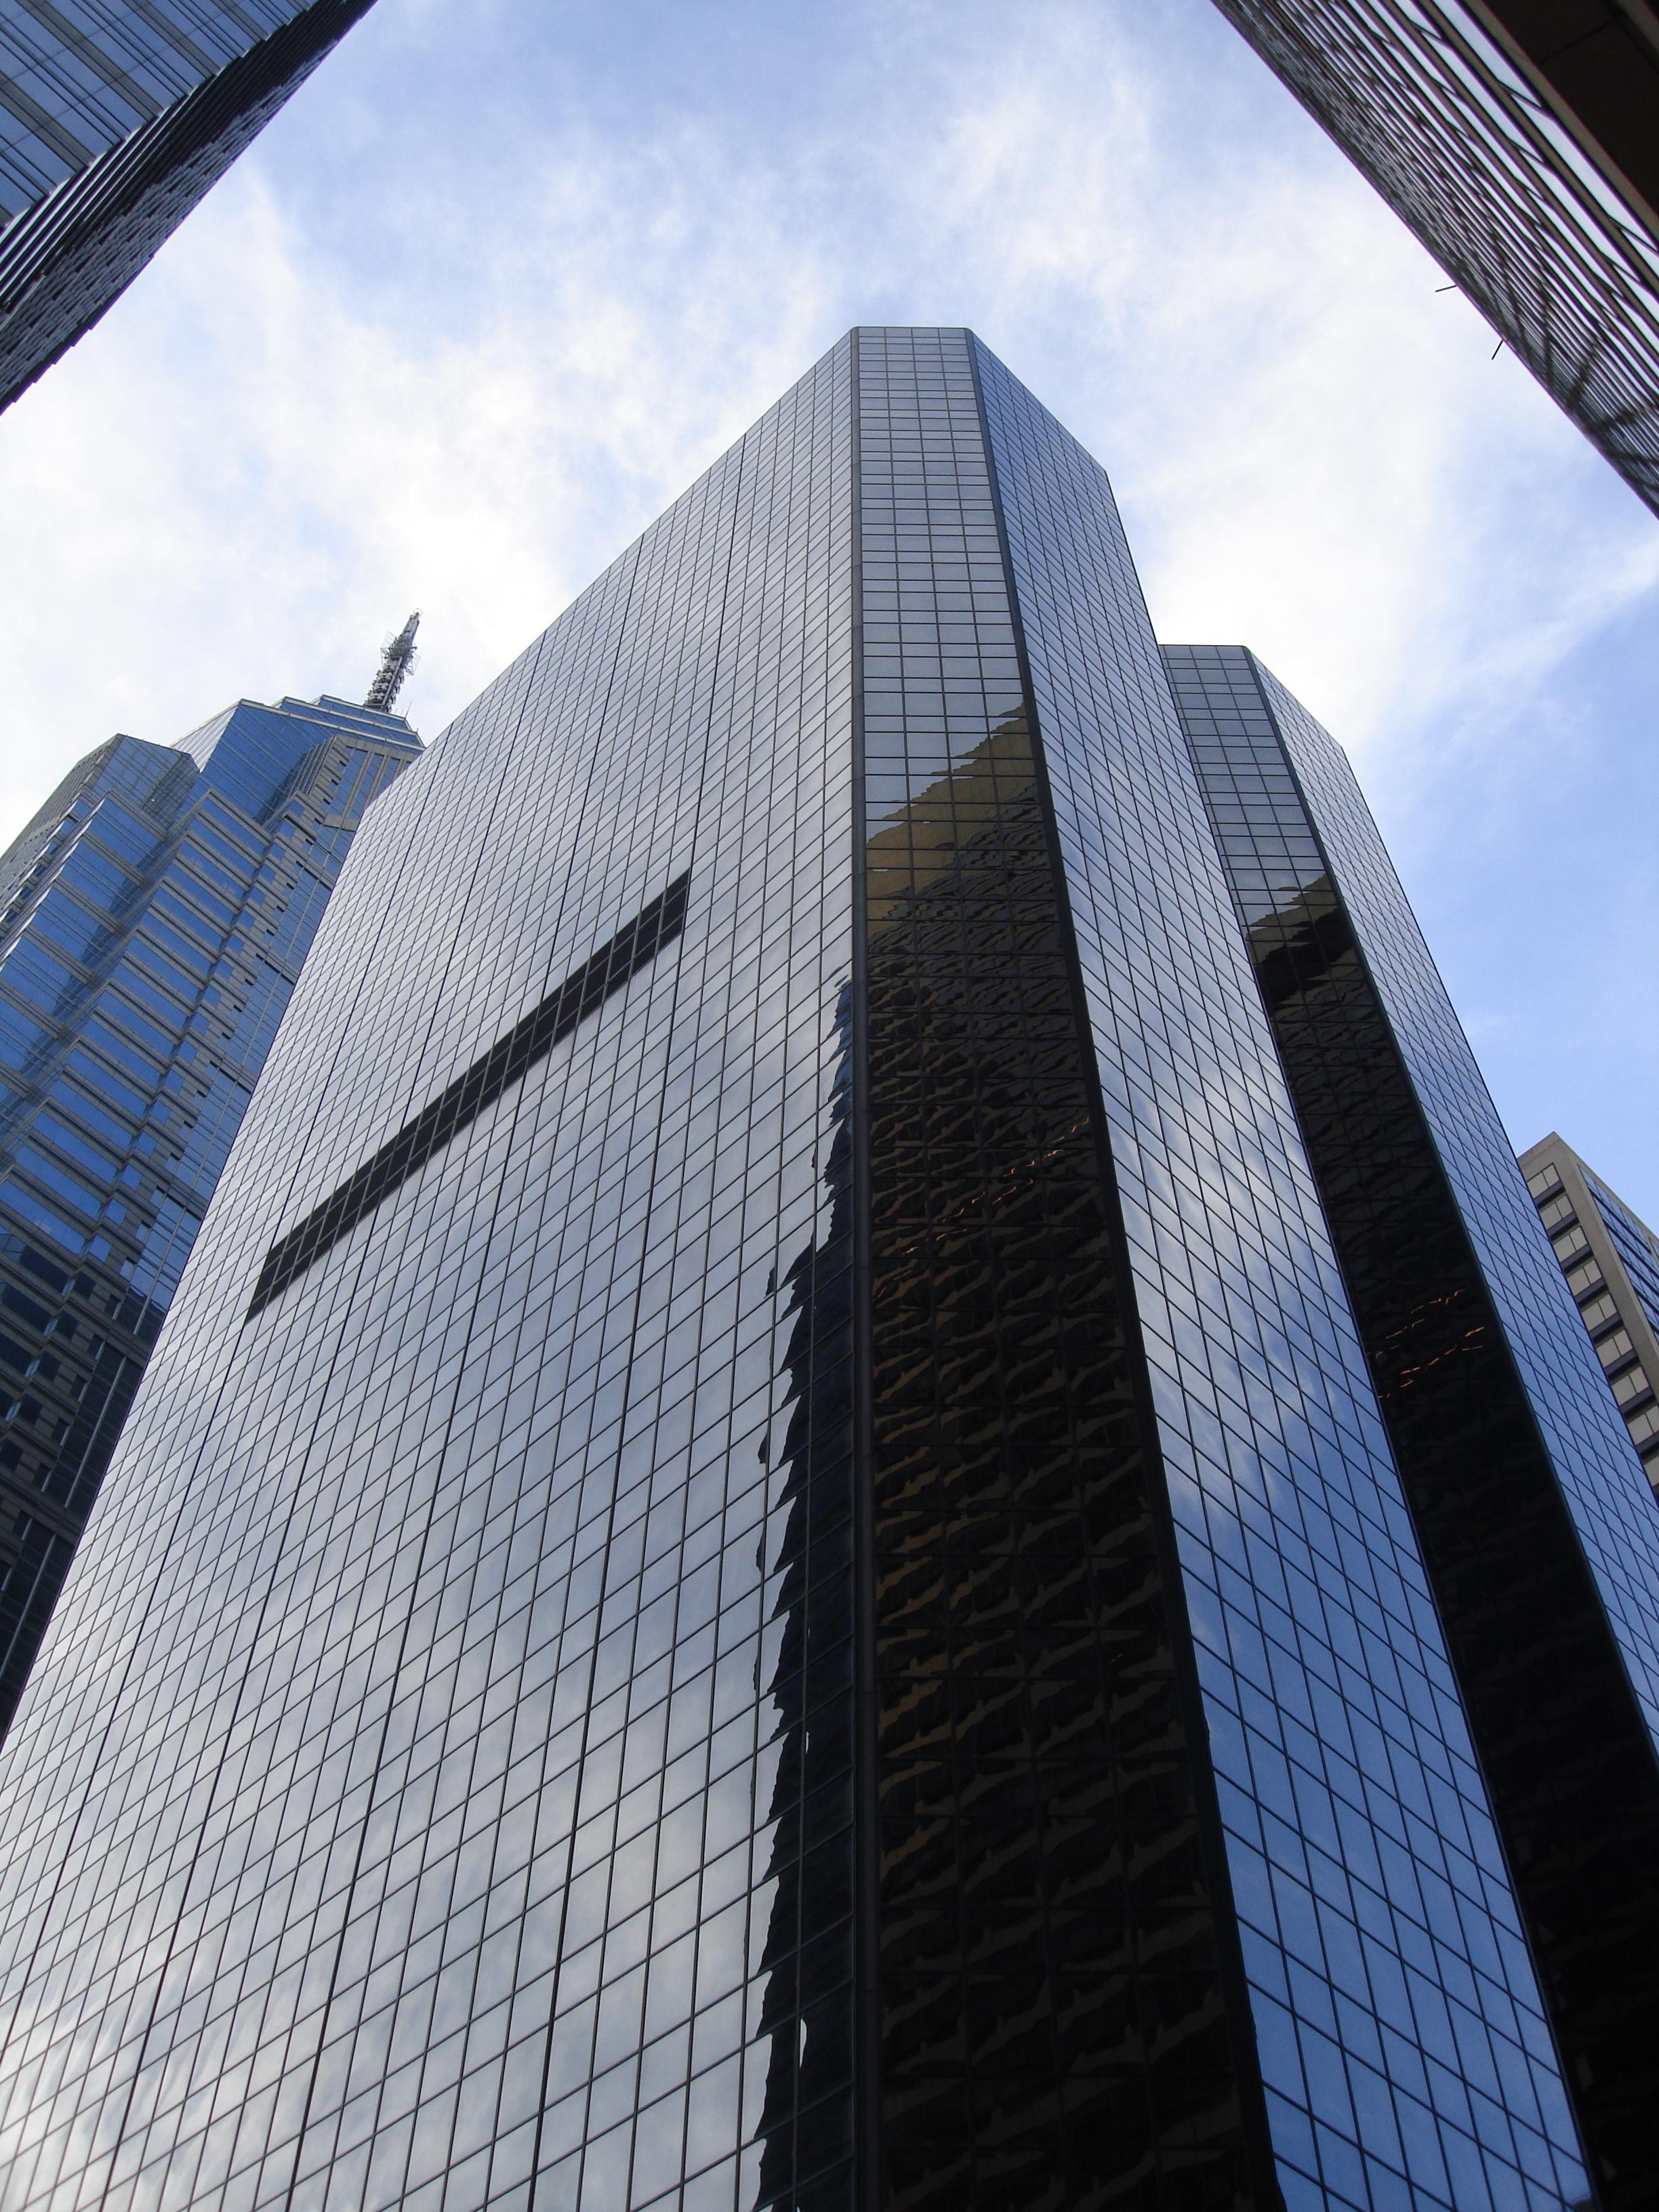 https://upload.wikimedia.org/wikipedia/commons/7/72/PNC_Bank_Building%2C_Philadelphia.jpg